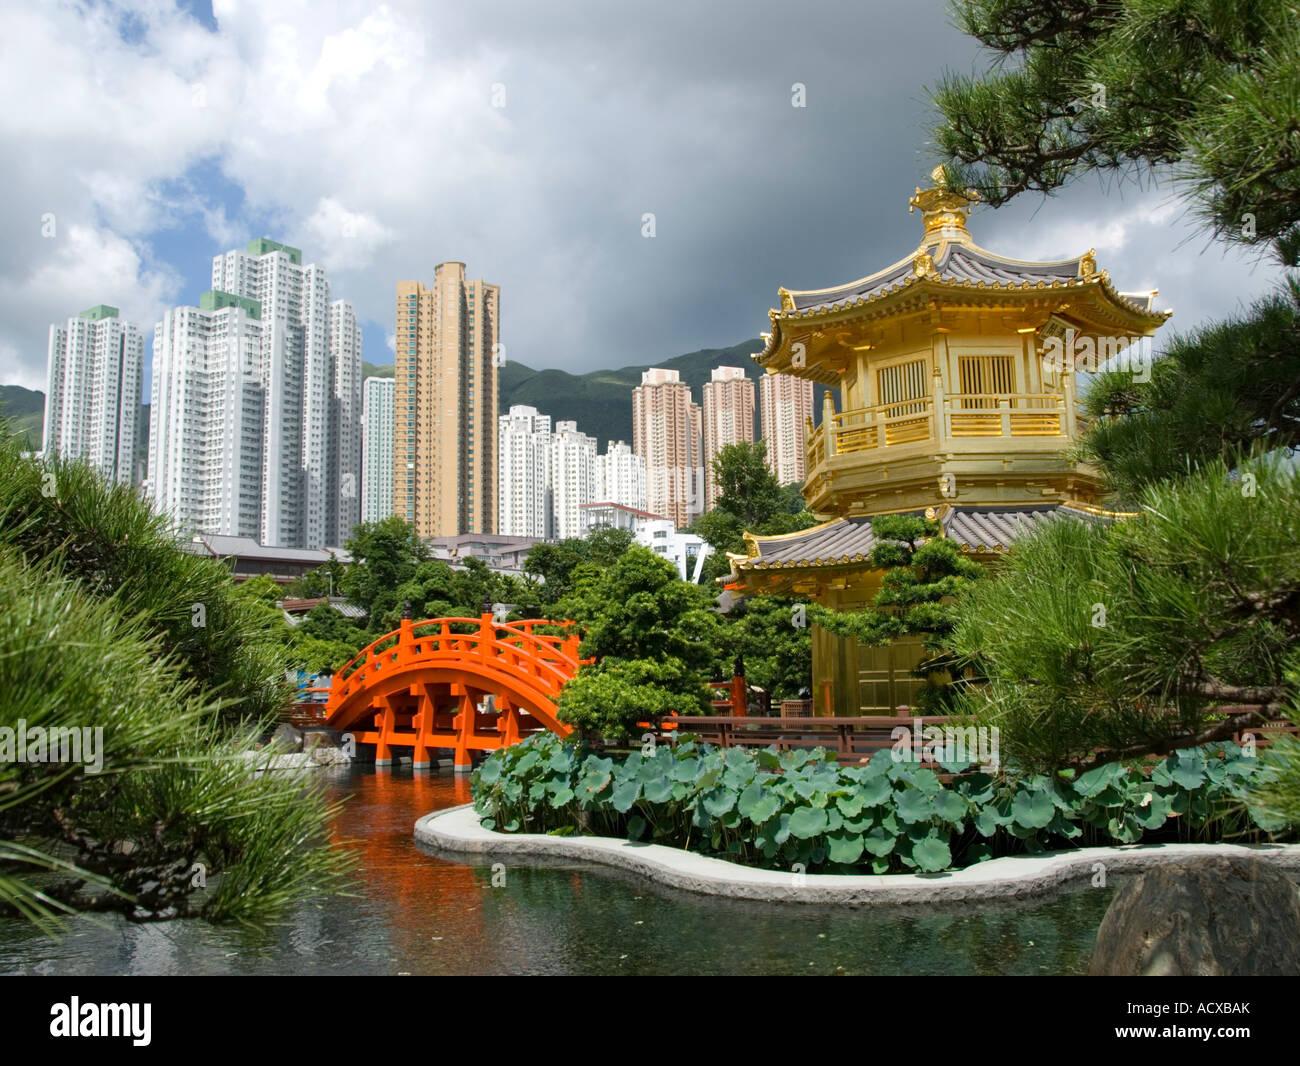 Le pavillon d'or et du pont de Nan Lian Garden à côté de Chi Lin Nunnery Hong Kong 2007 Photo Stock